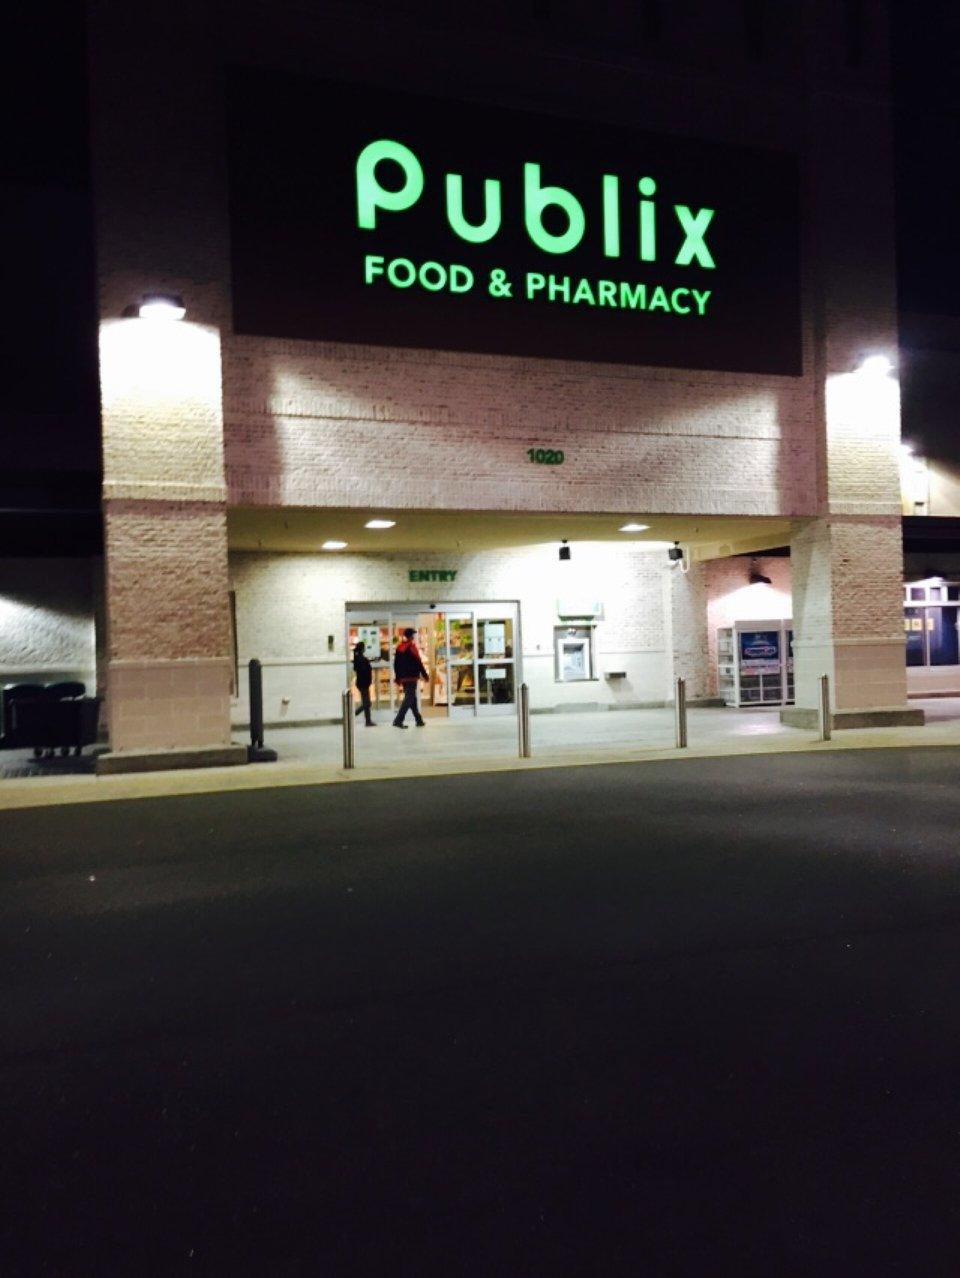 Publix Pharmacy Cary